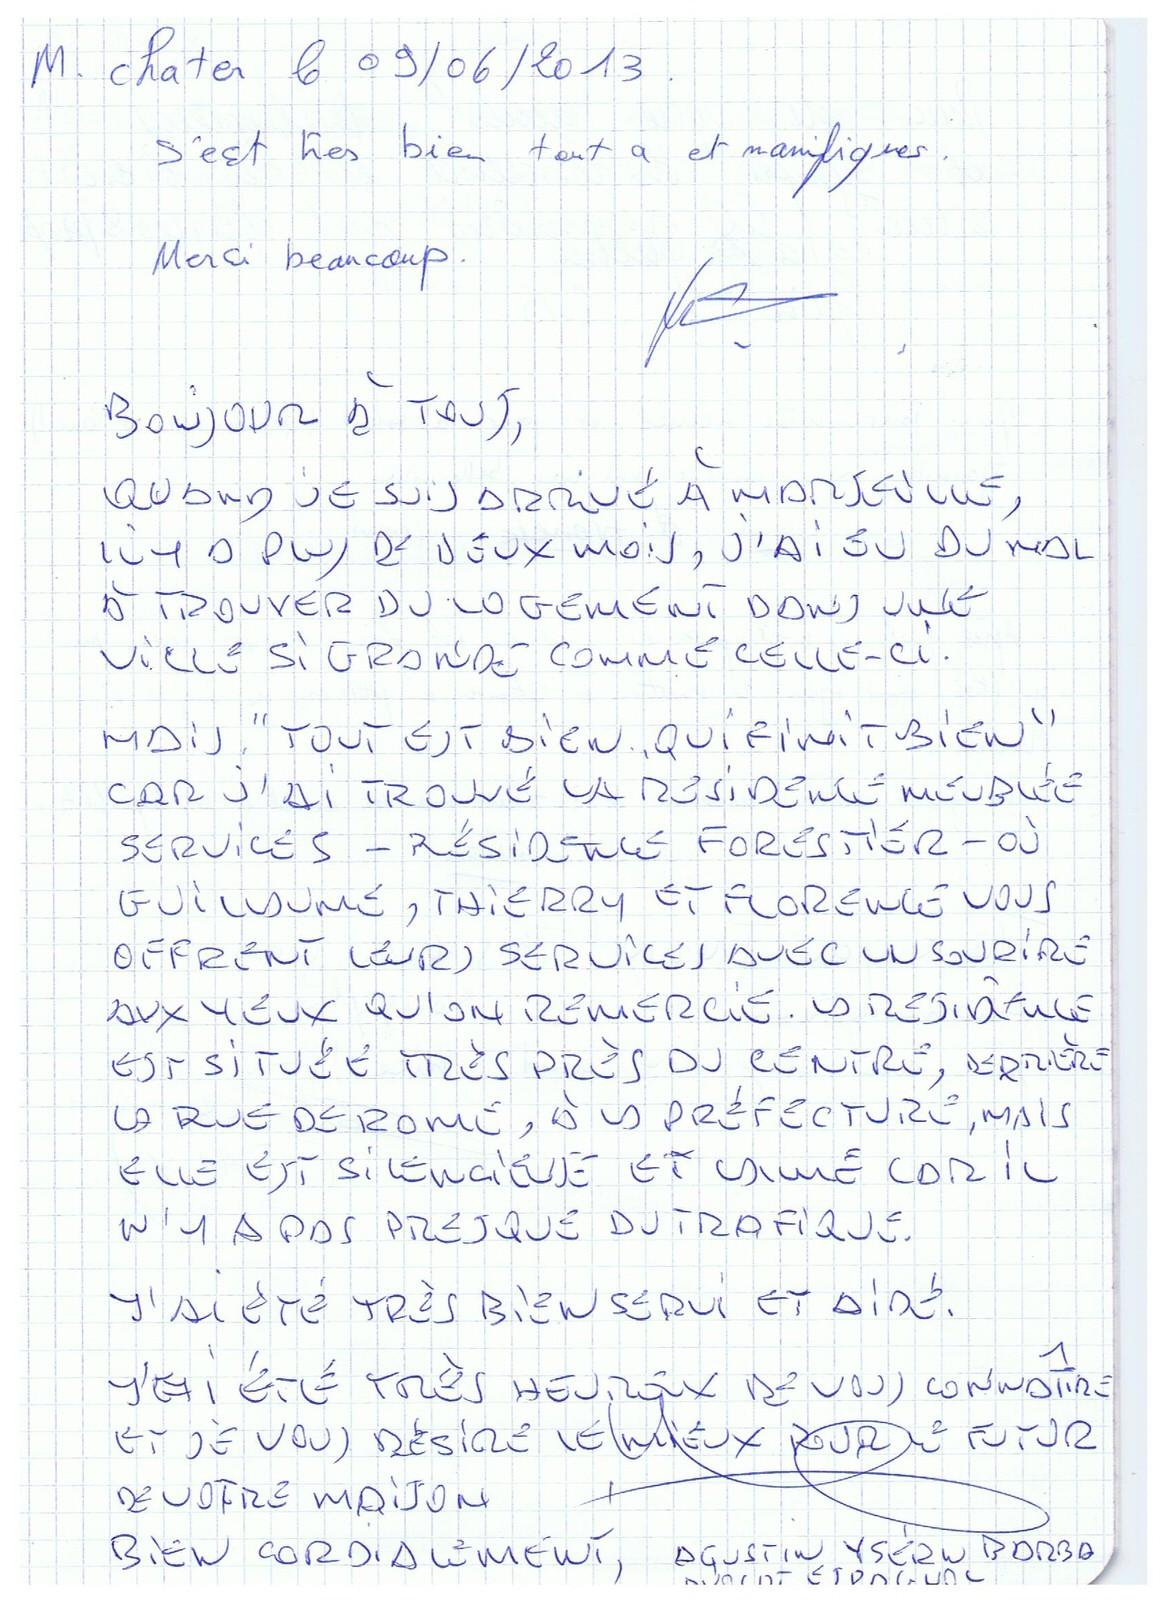 Livre d'Or Résidence p3 001.jpg